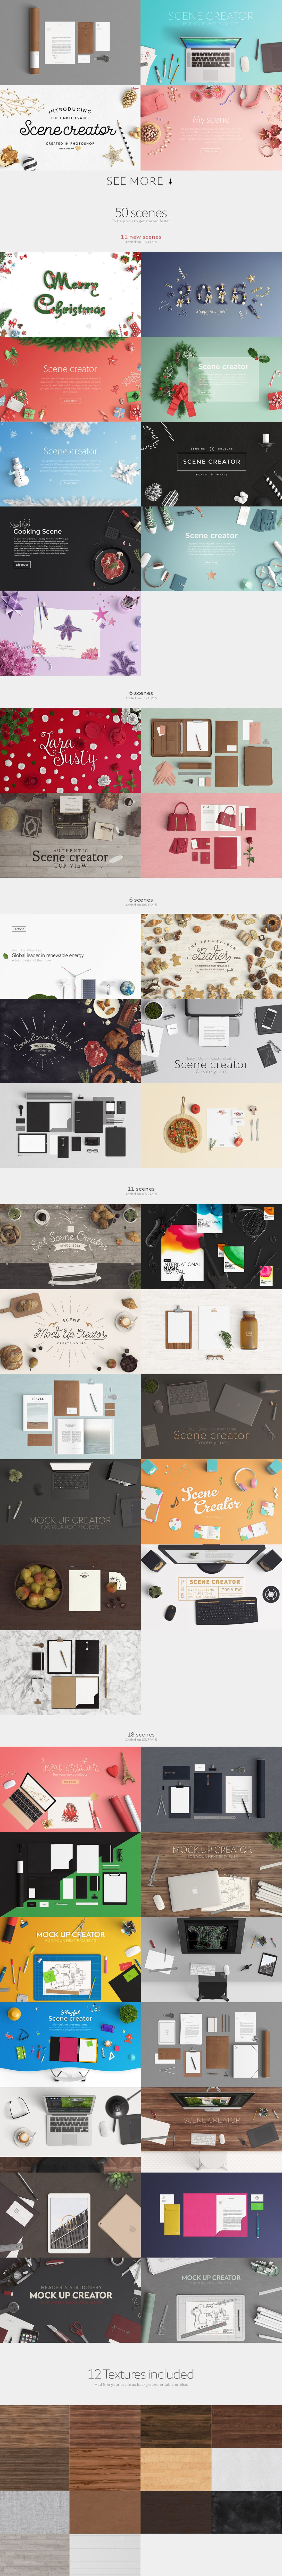 creative-market-scene-creator-bundle-12